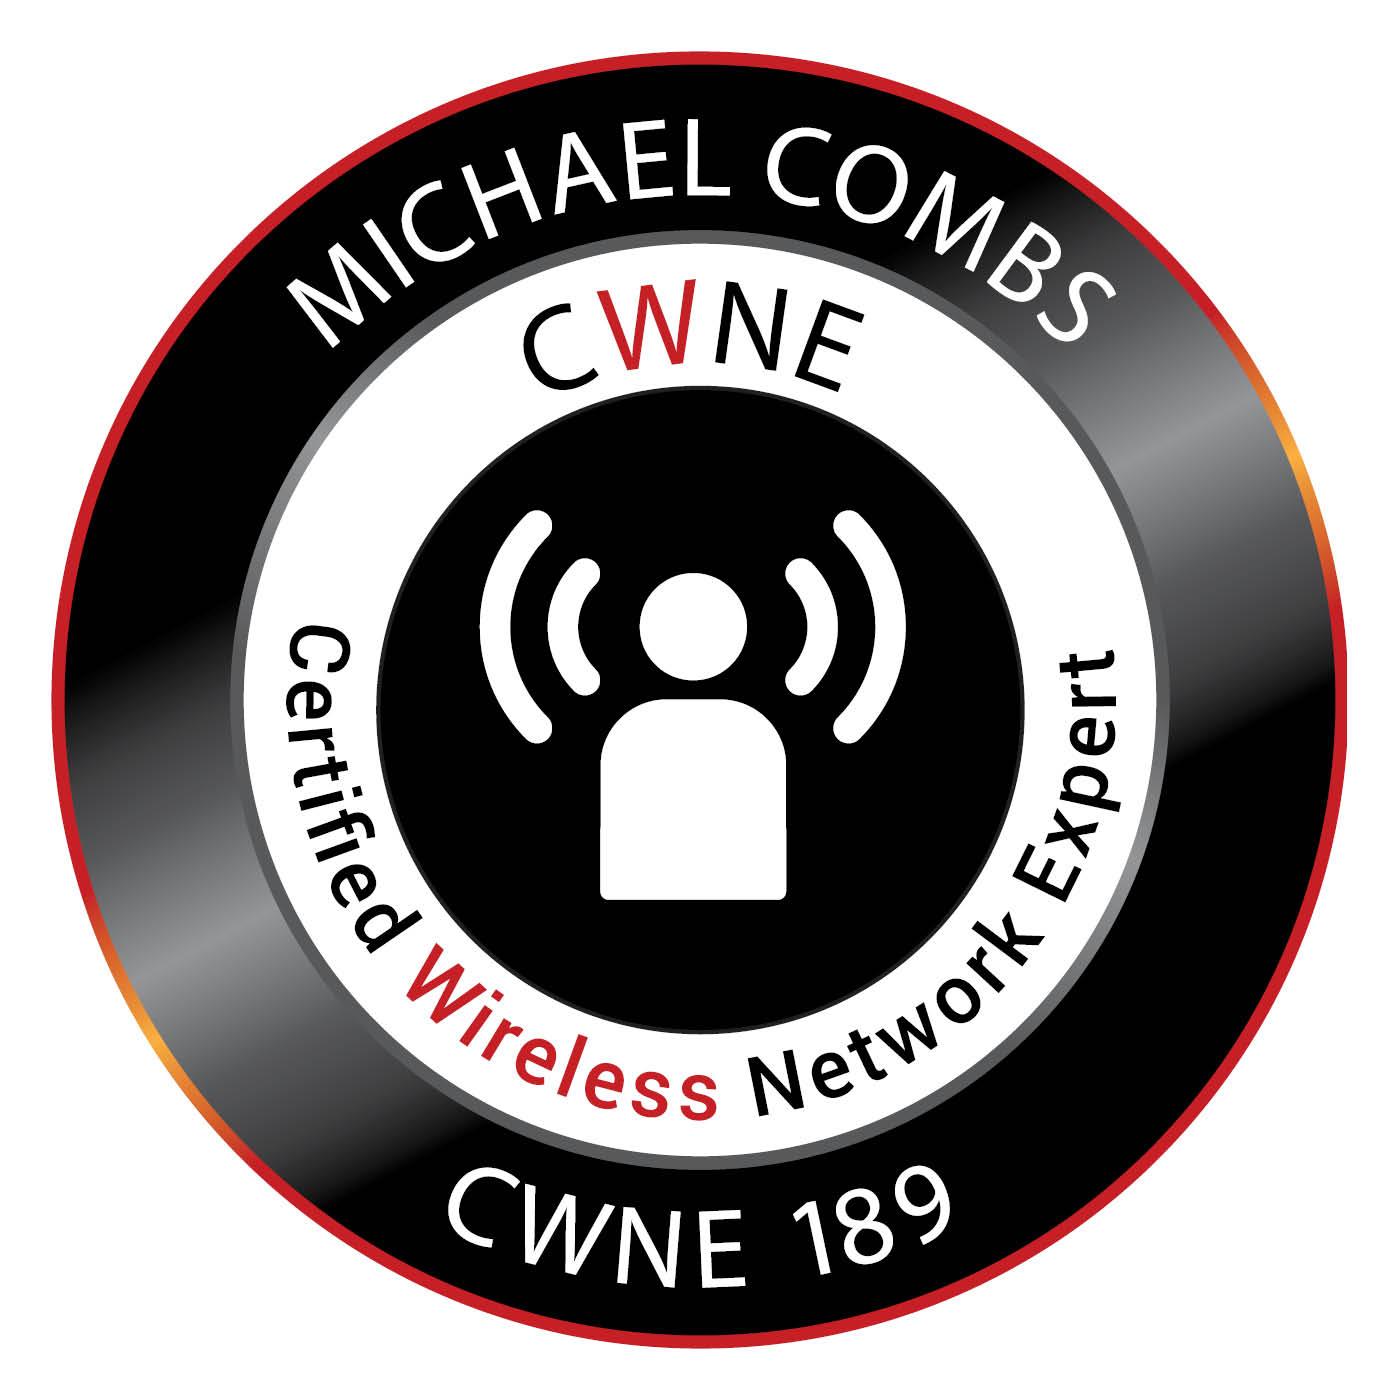 Michael Combs